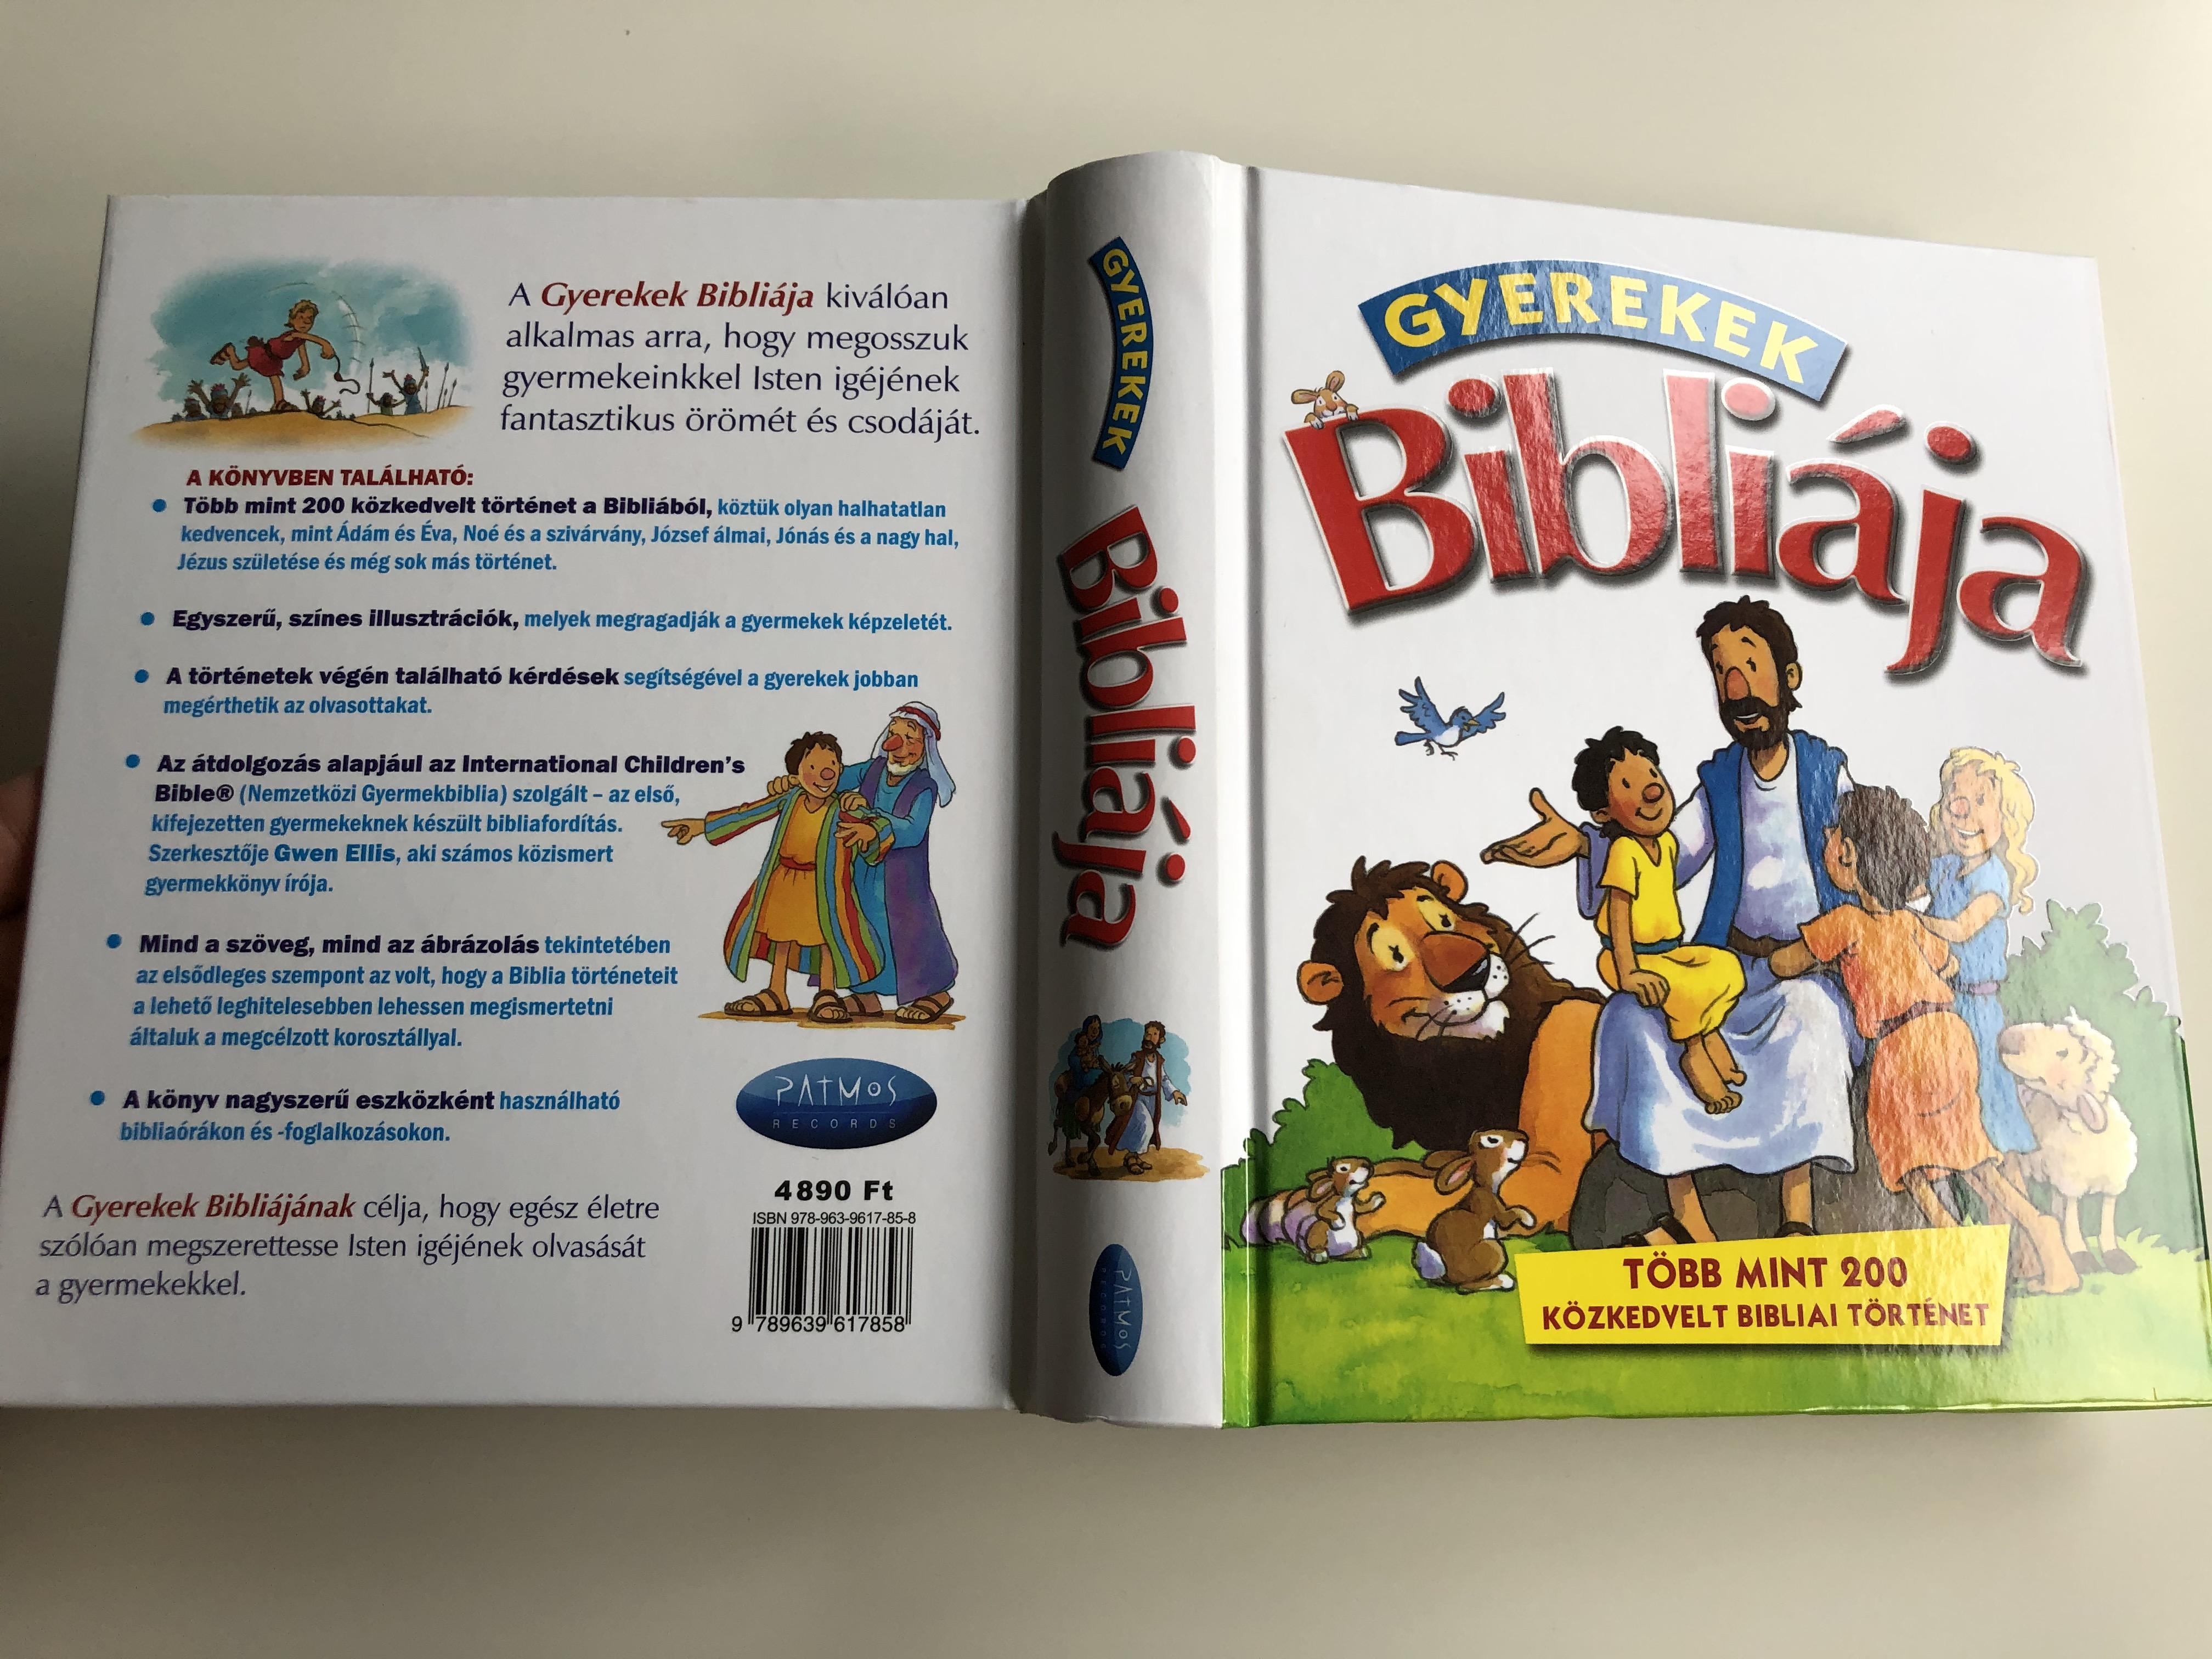 gyerekek-bibli-ja-hungarian-edition-of-read-share-bible-by-gwen-ellis-22.jpg